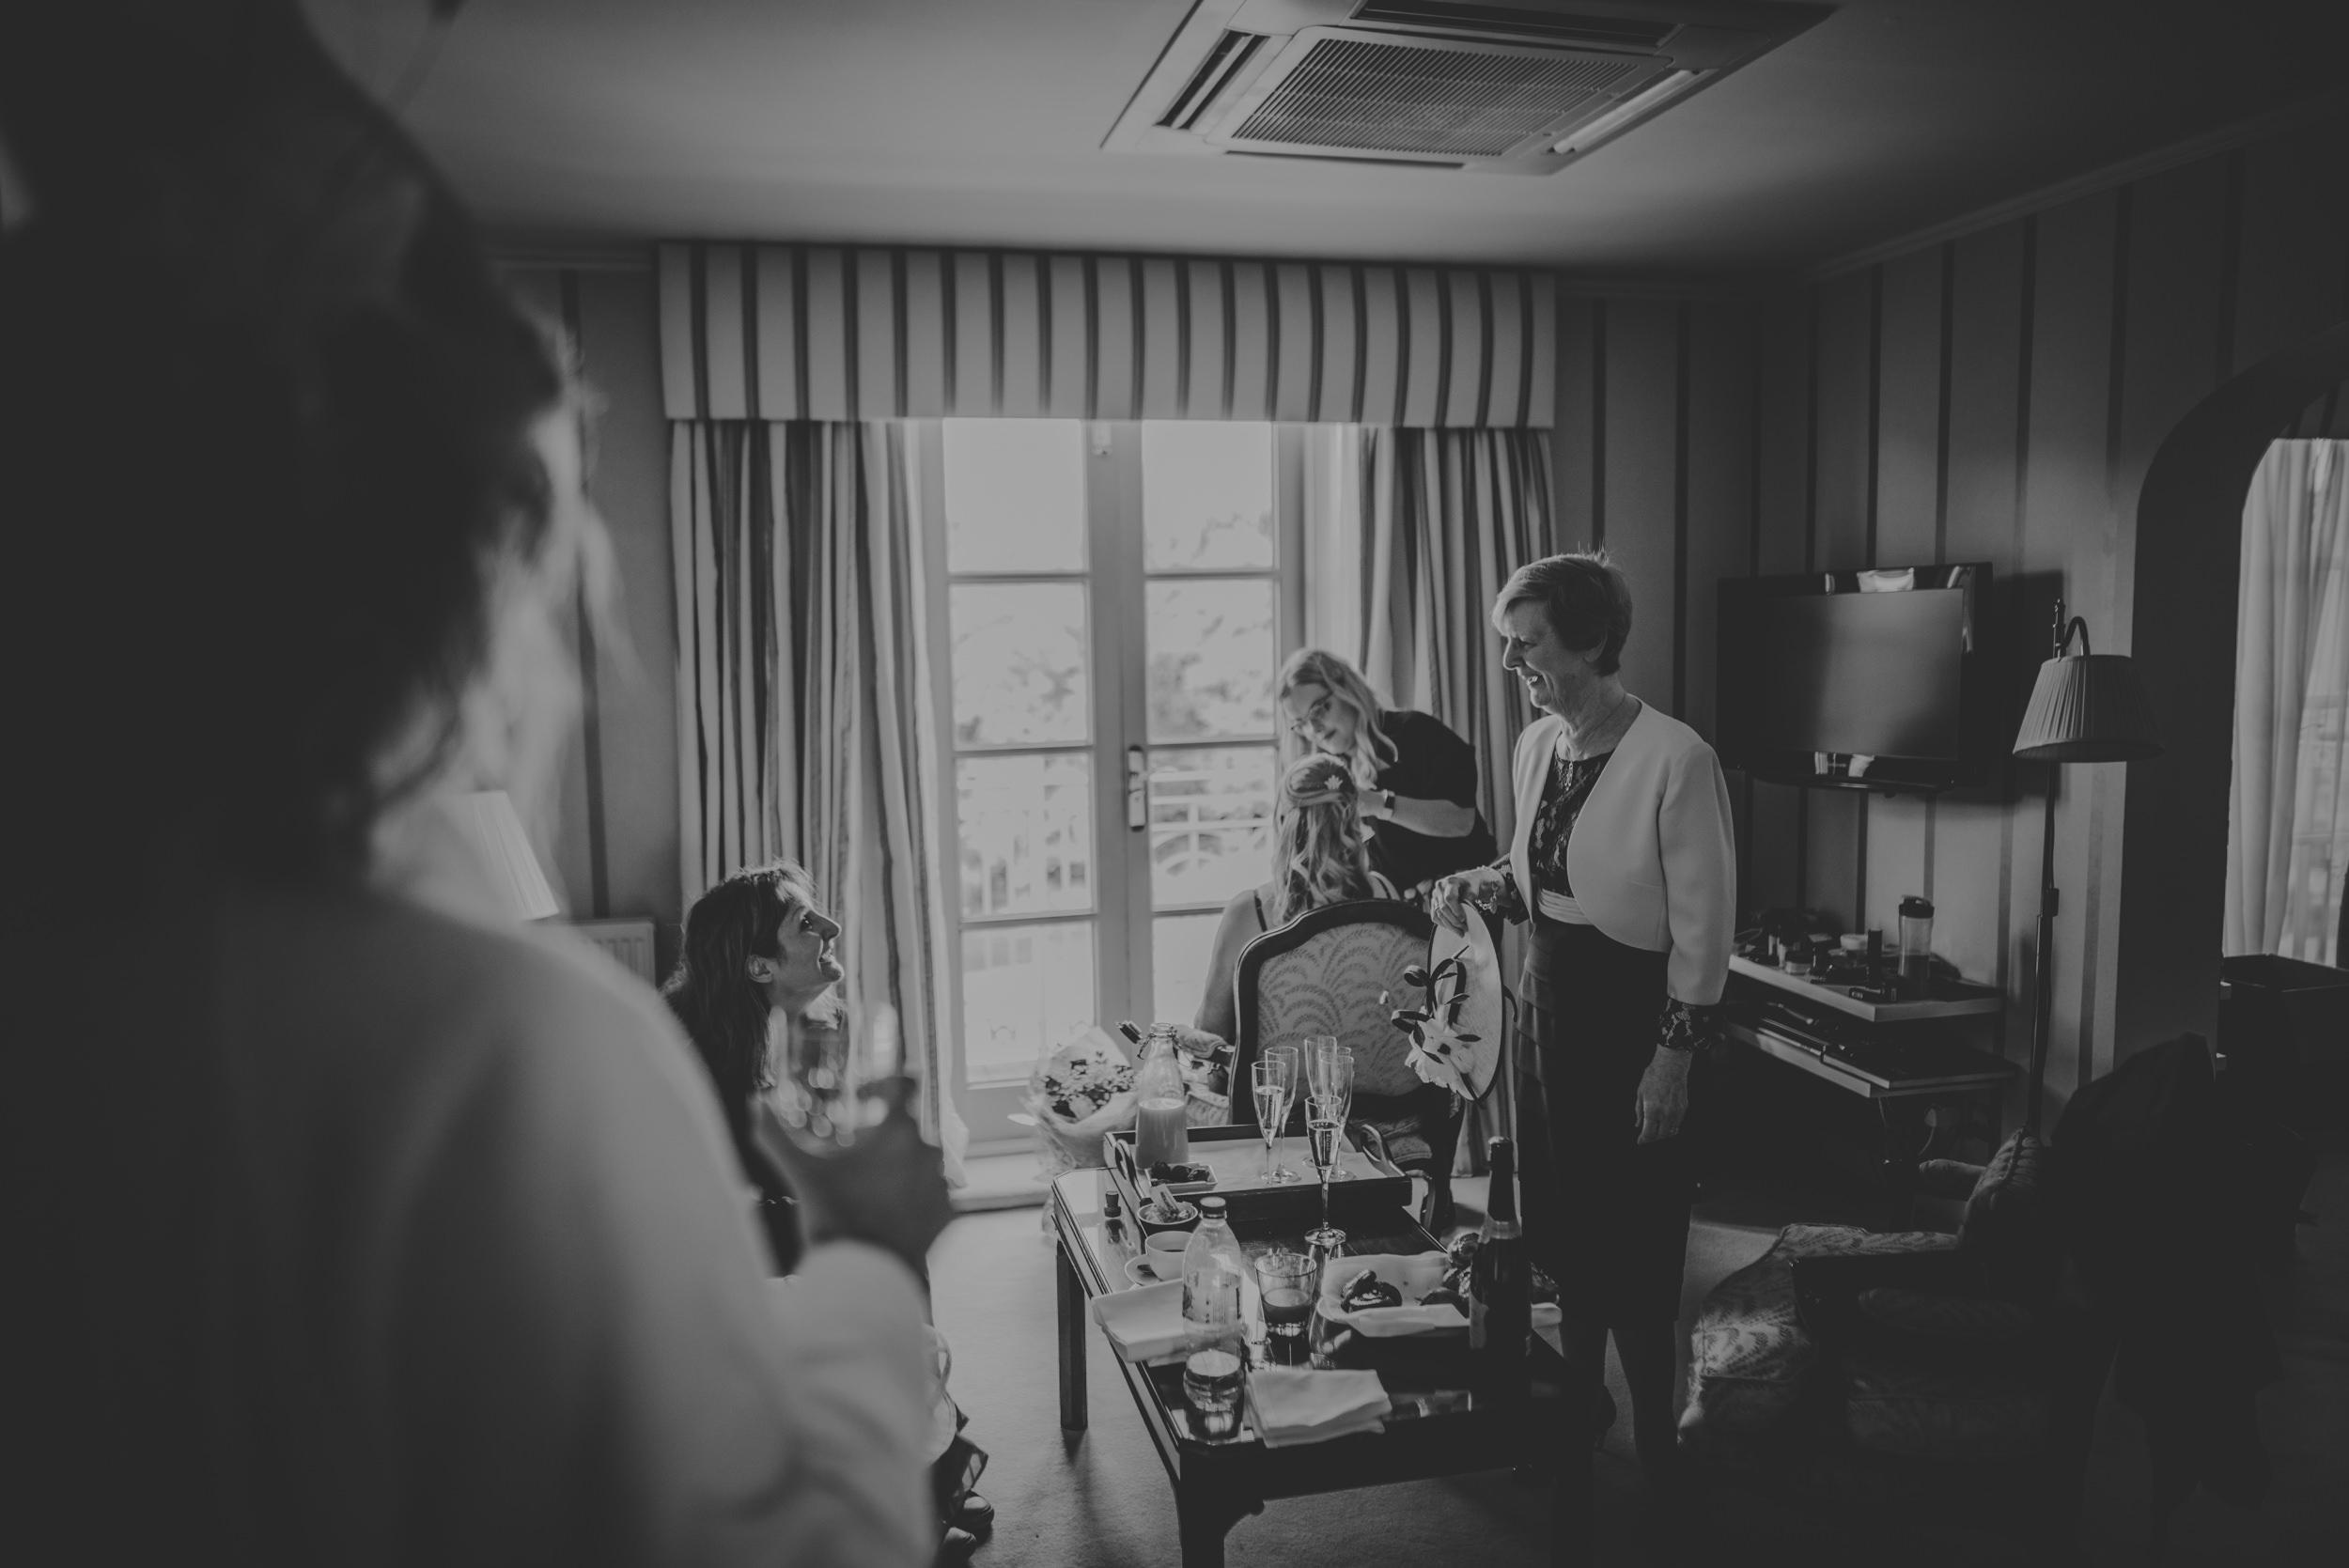 Trisha-and-Roger-wedding-The-Priory-Church-and-Chewton-Glen-Hotel-Christchurch-Manu-Mendoza-Wedding-Photography-023.jpg